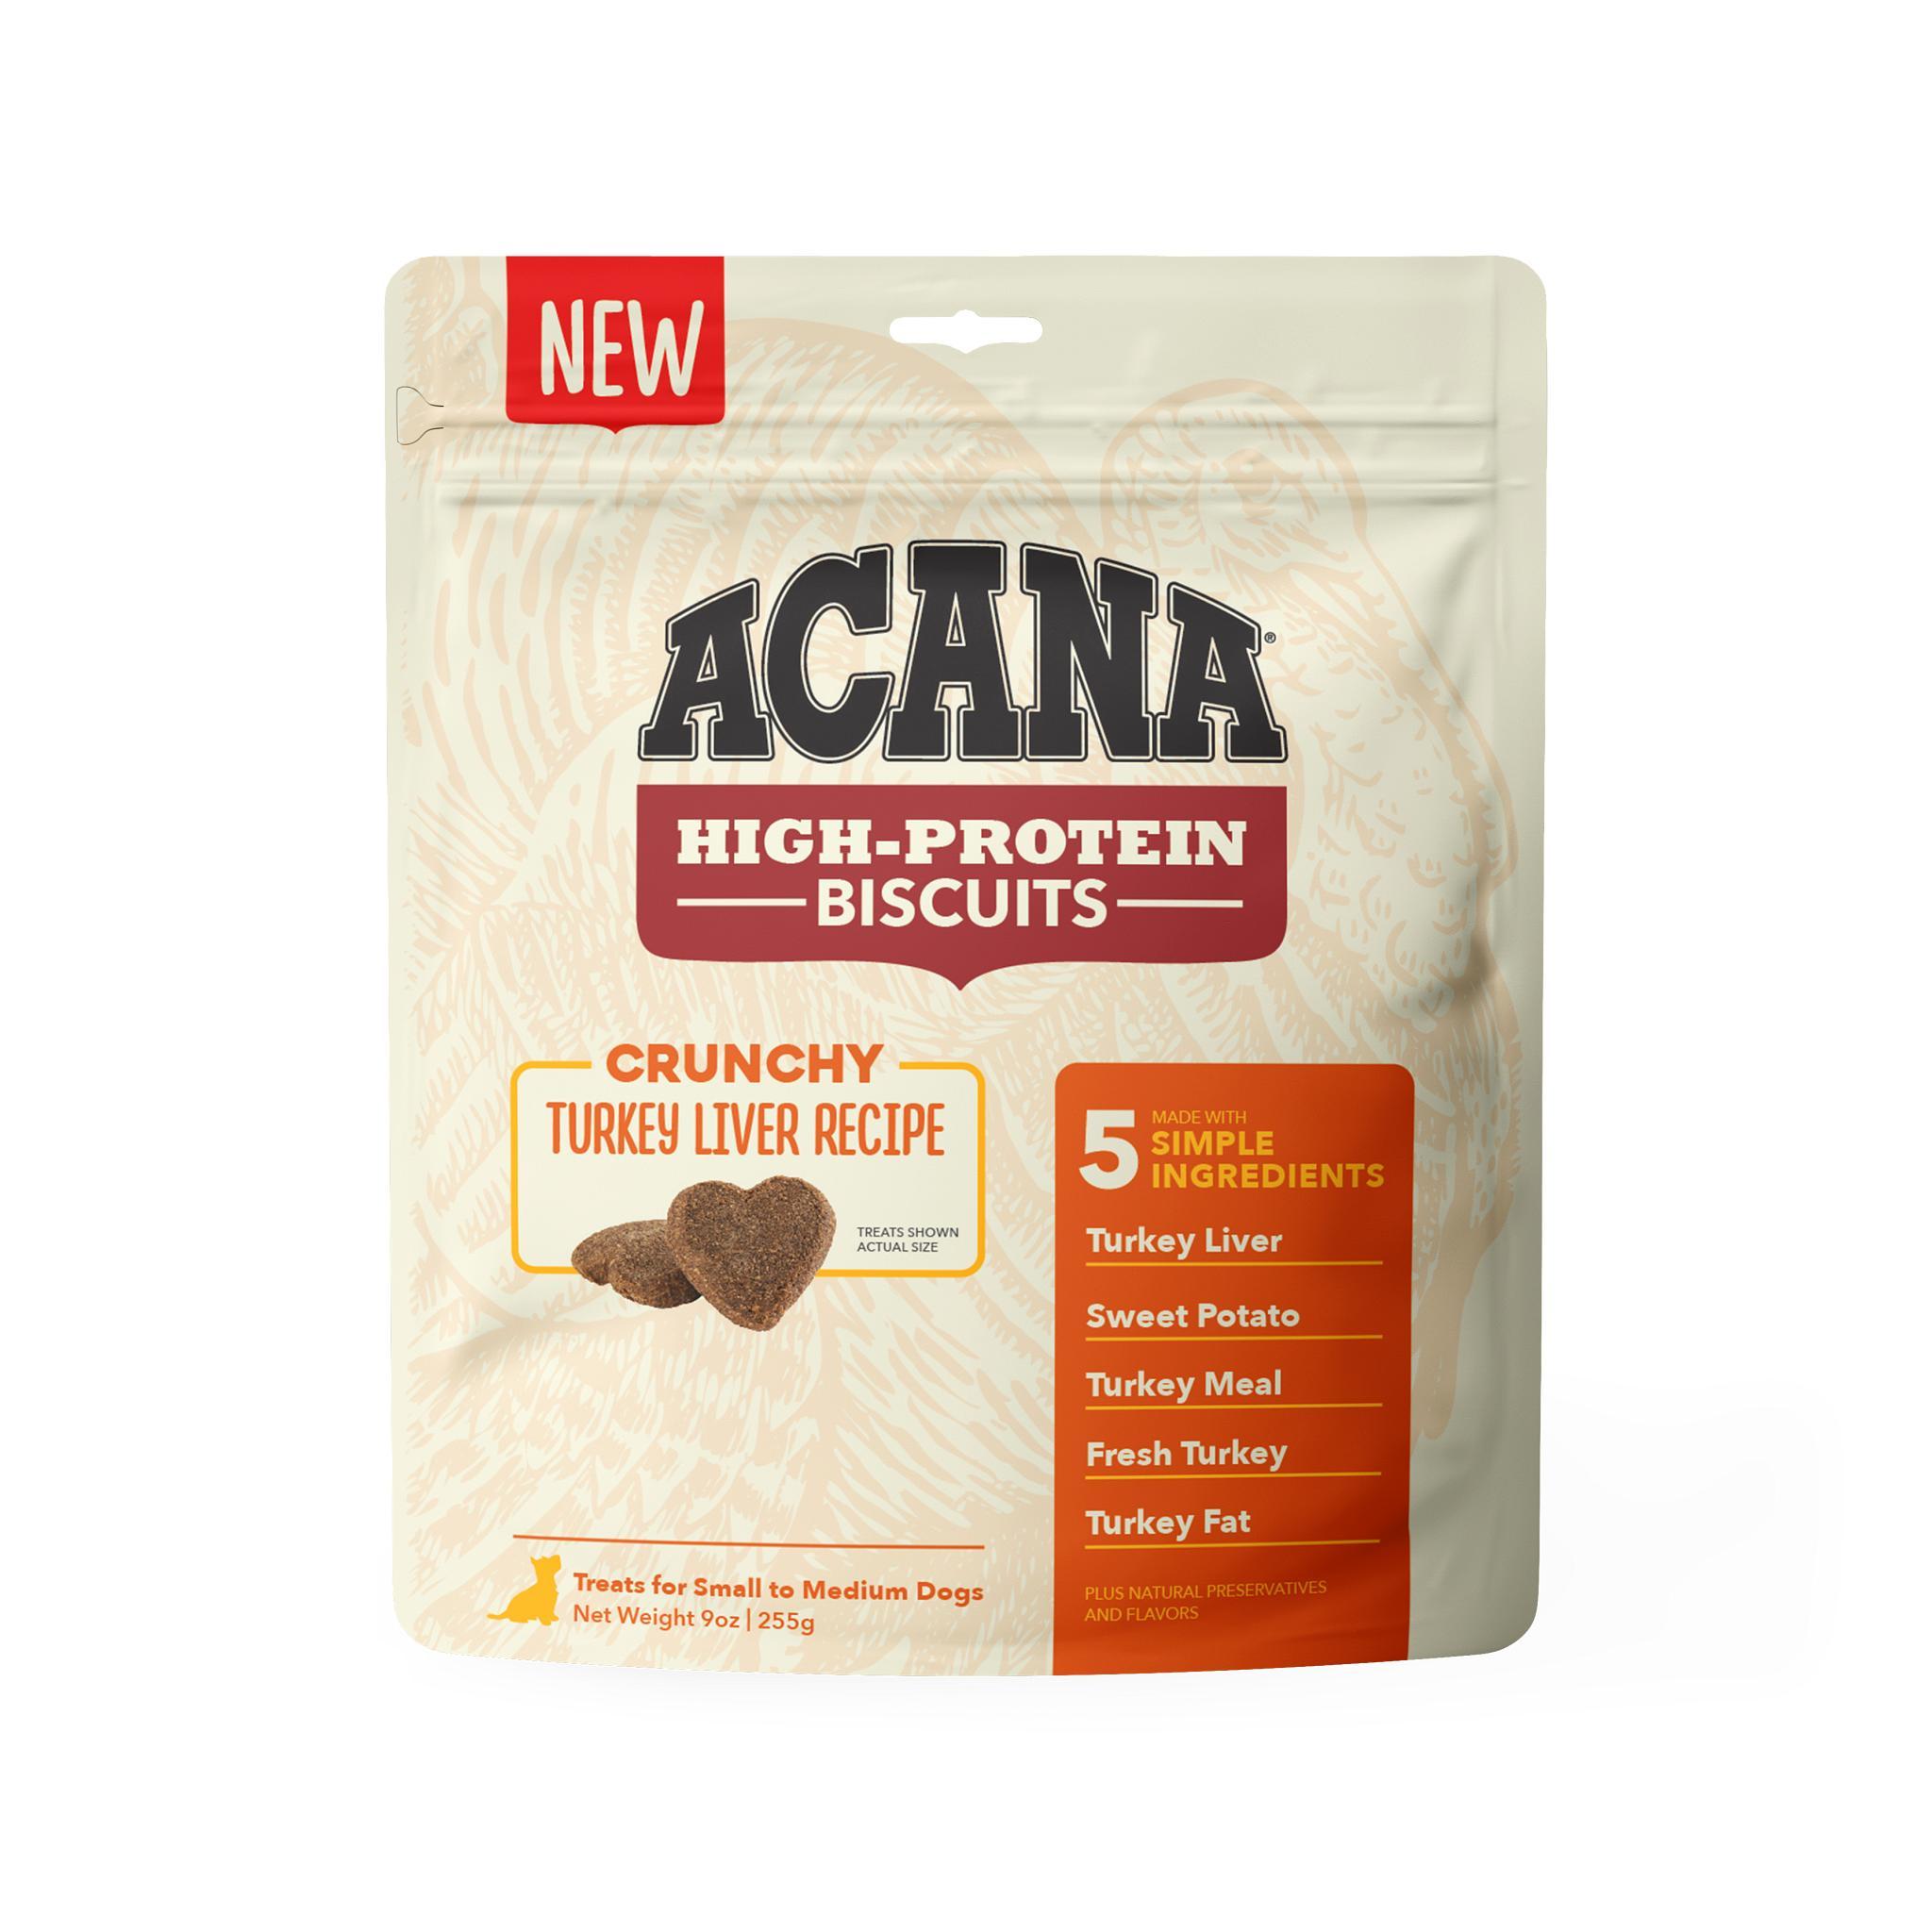 ACANA Crunchy Biscuits Turkey Liver Recipe Dog Treats Image